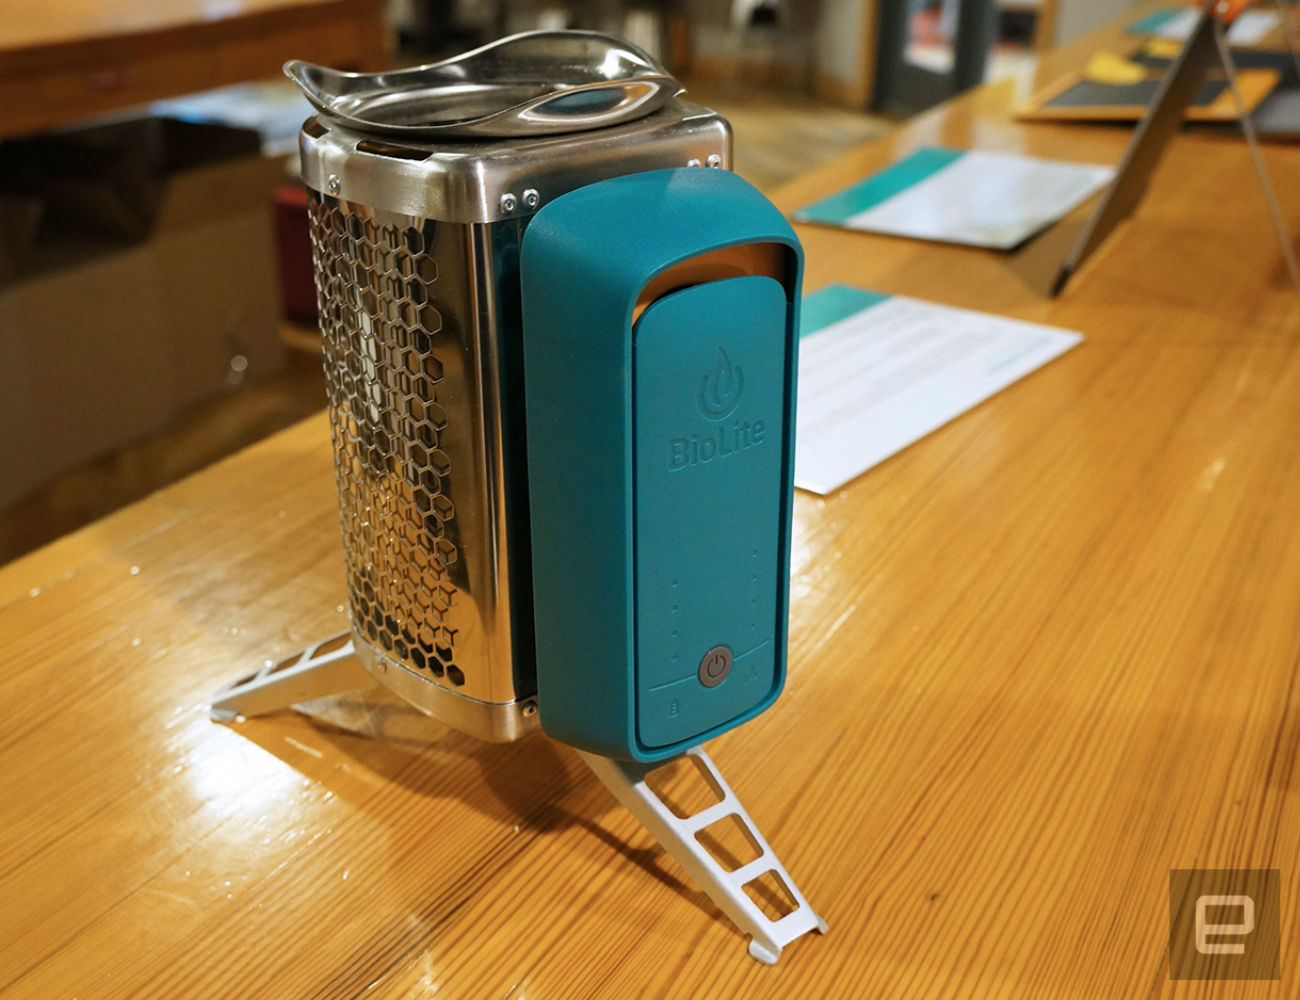 CookStove USB Stove by BioLite